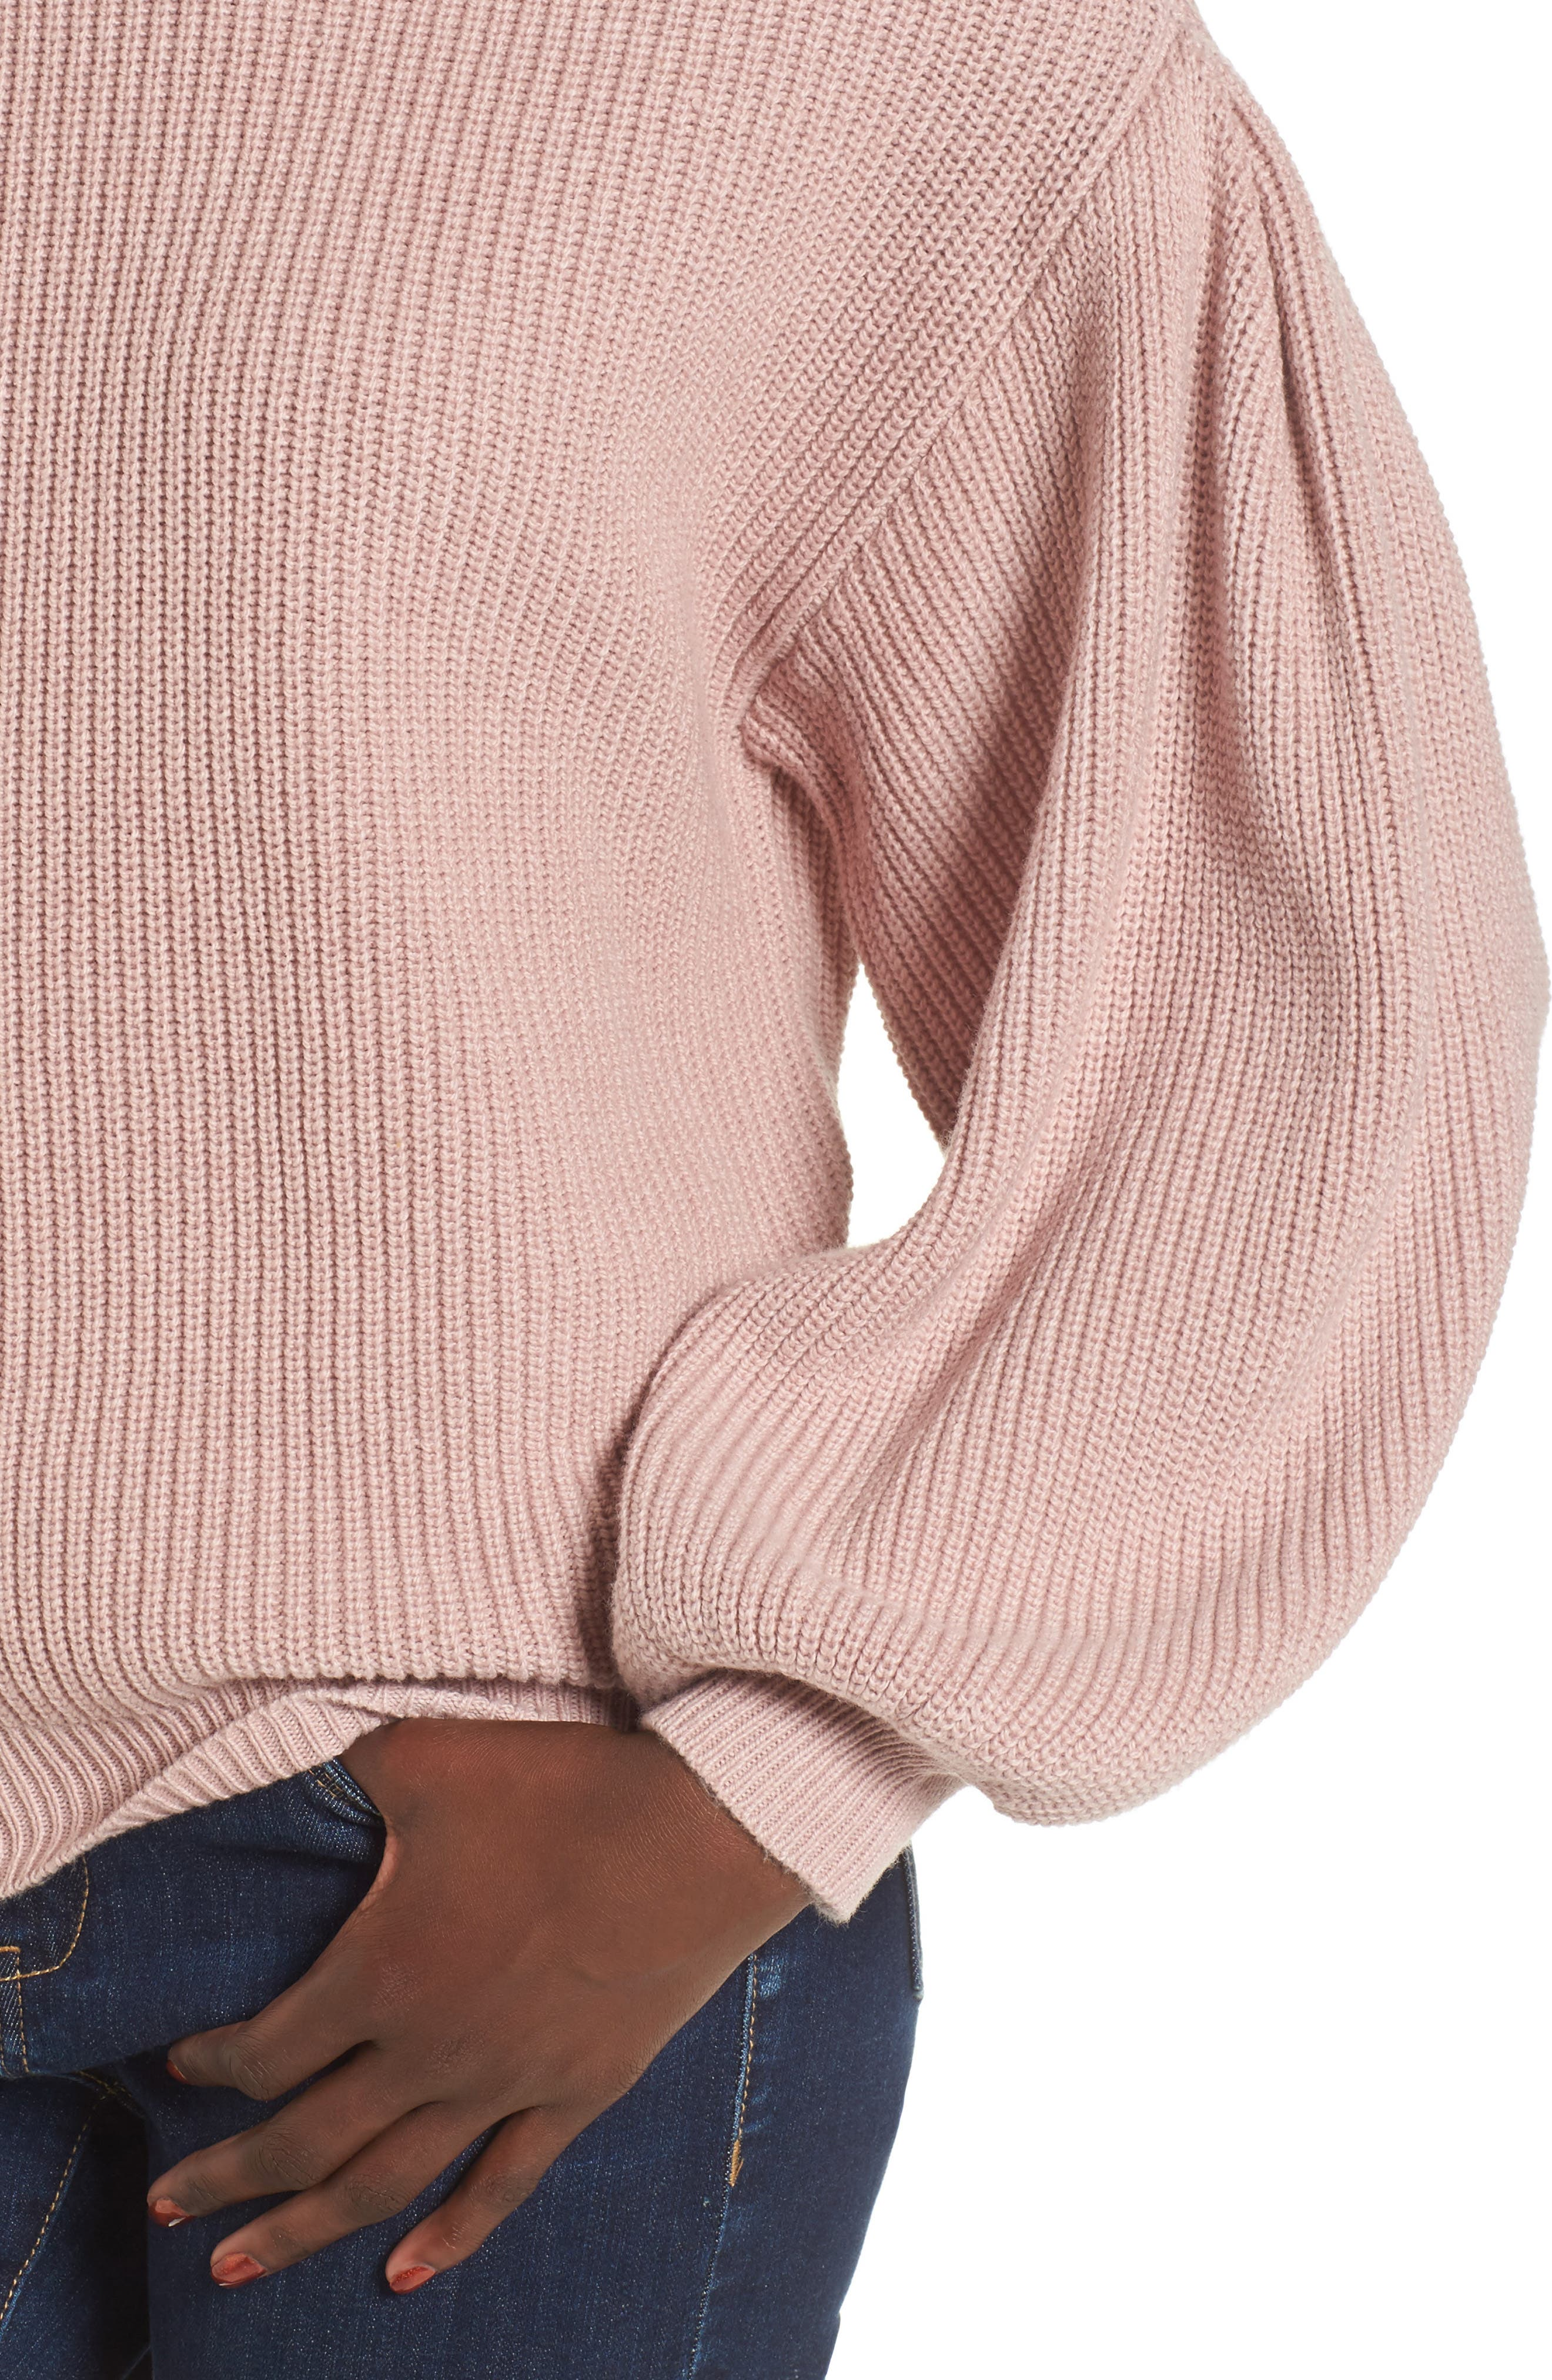 Blouson Sleeve Sweater,                             Alternate thumbnail 20, color,